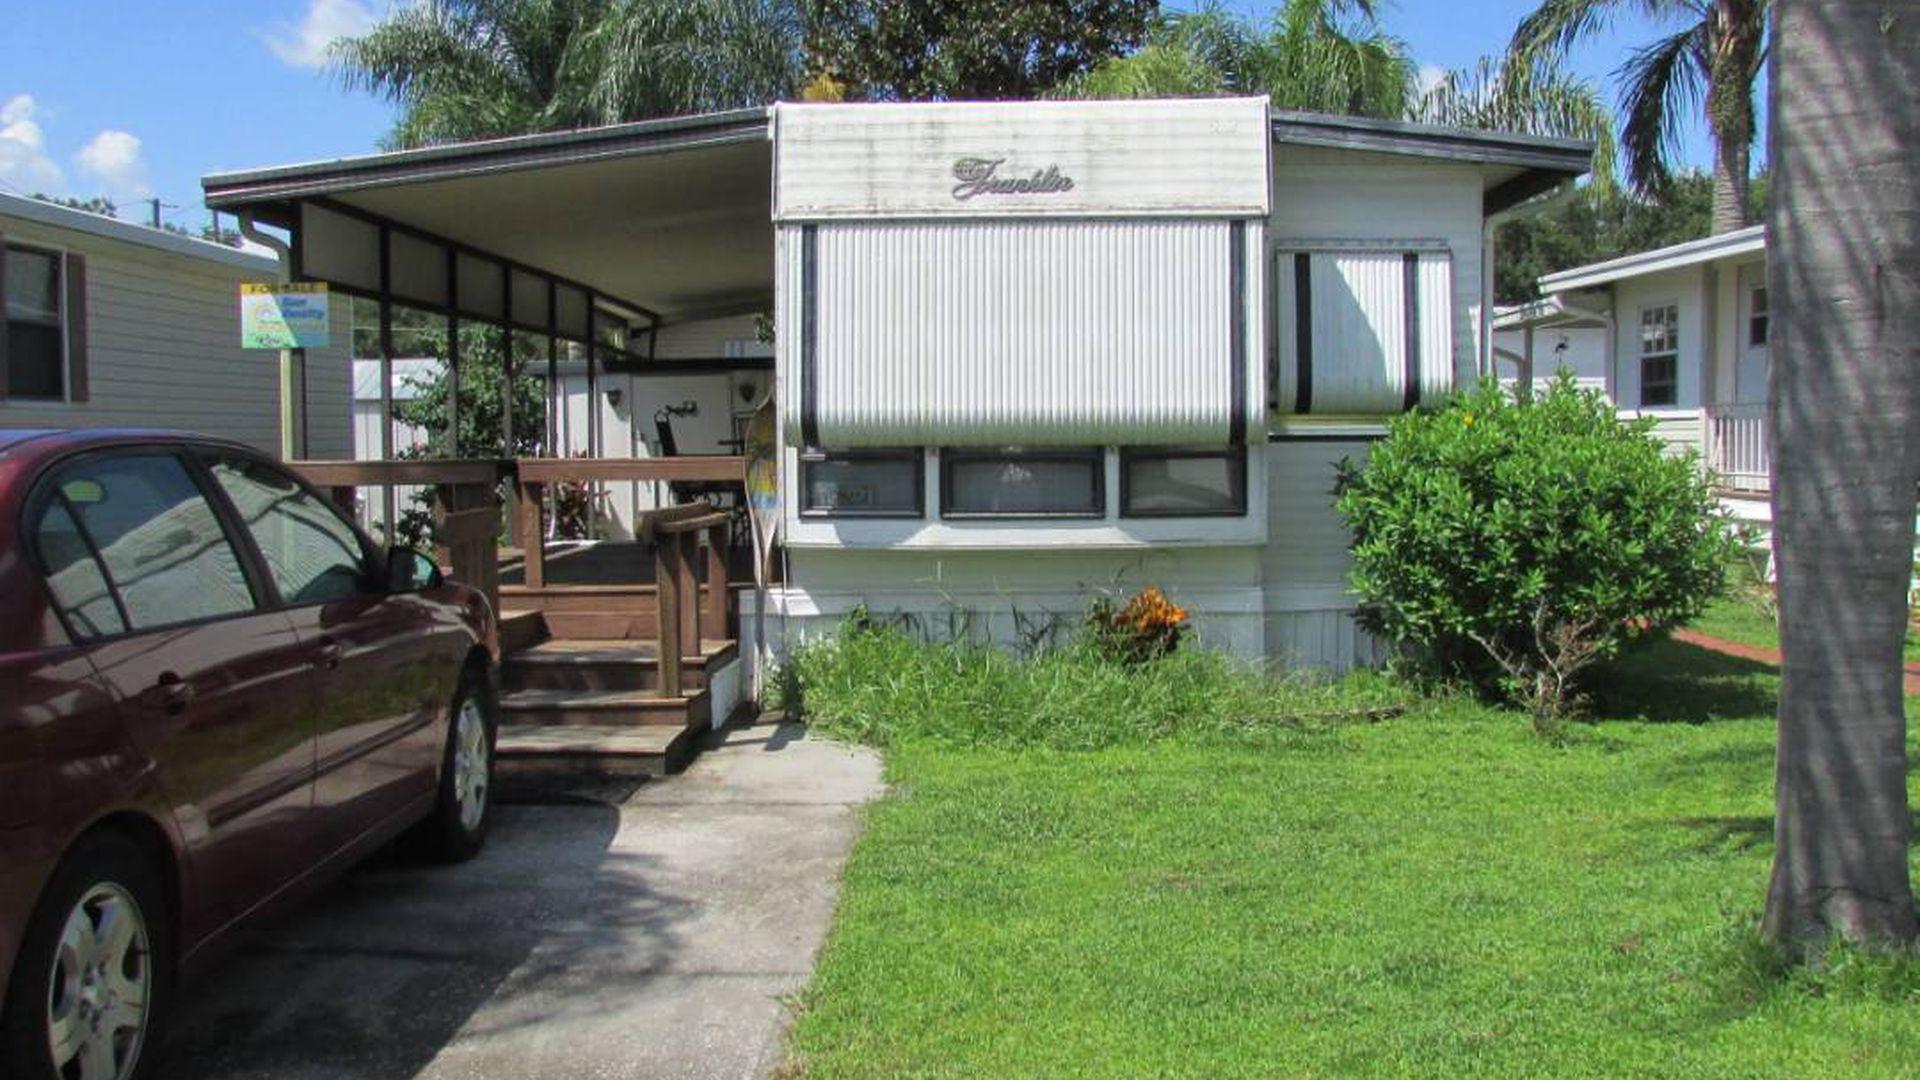 Mobile Home Park - Zephyrhills Real Estate - Zephyrhills FL